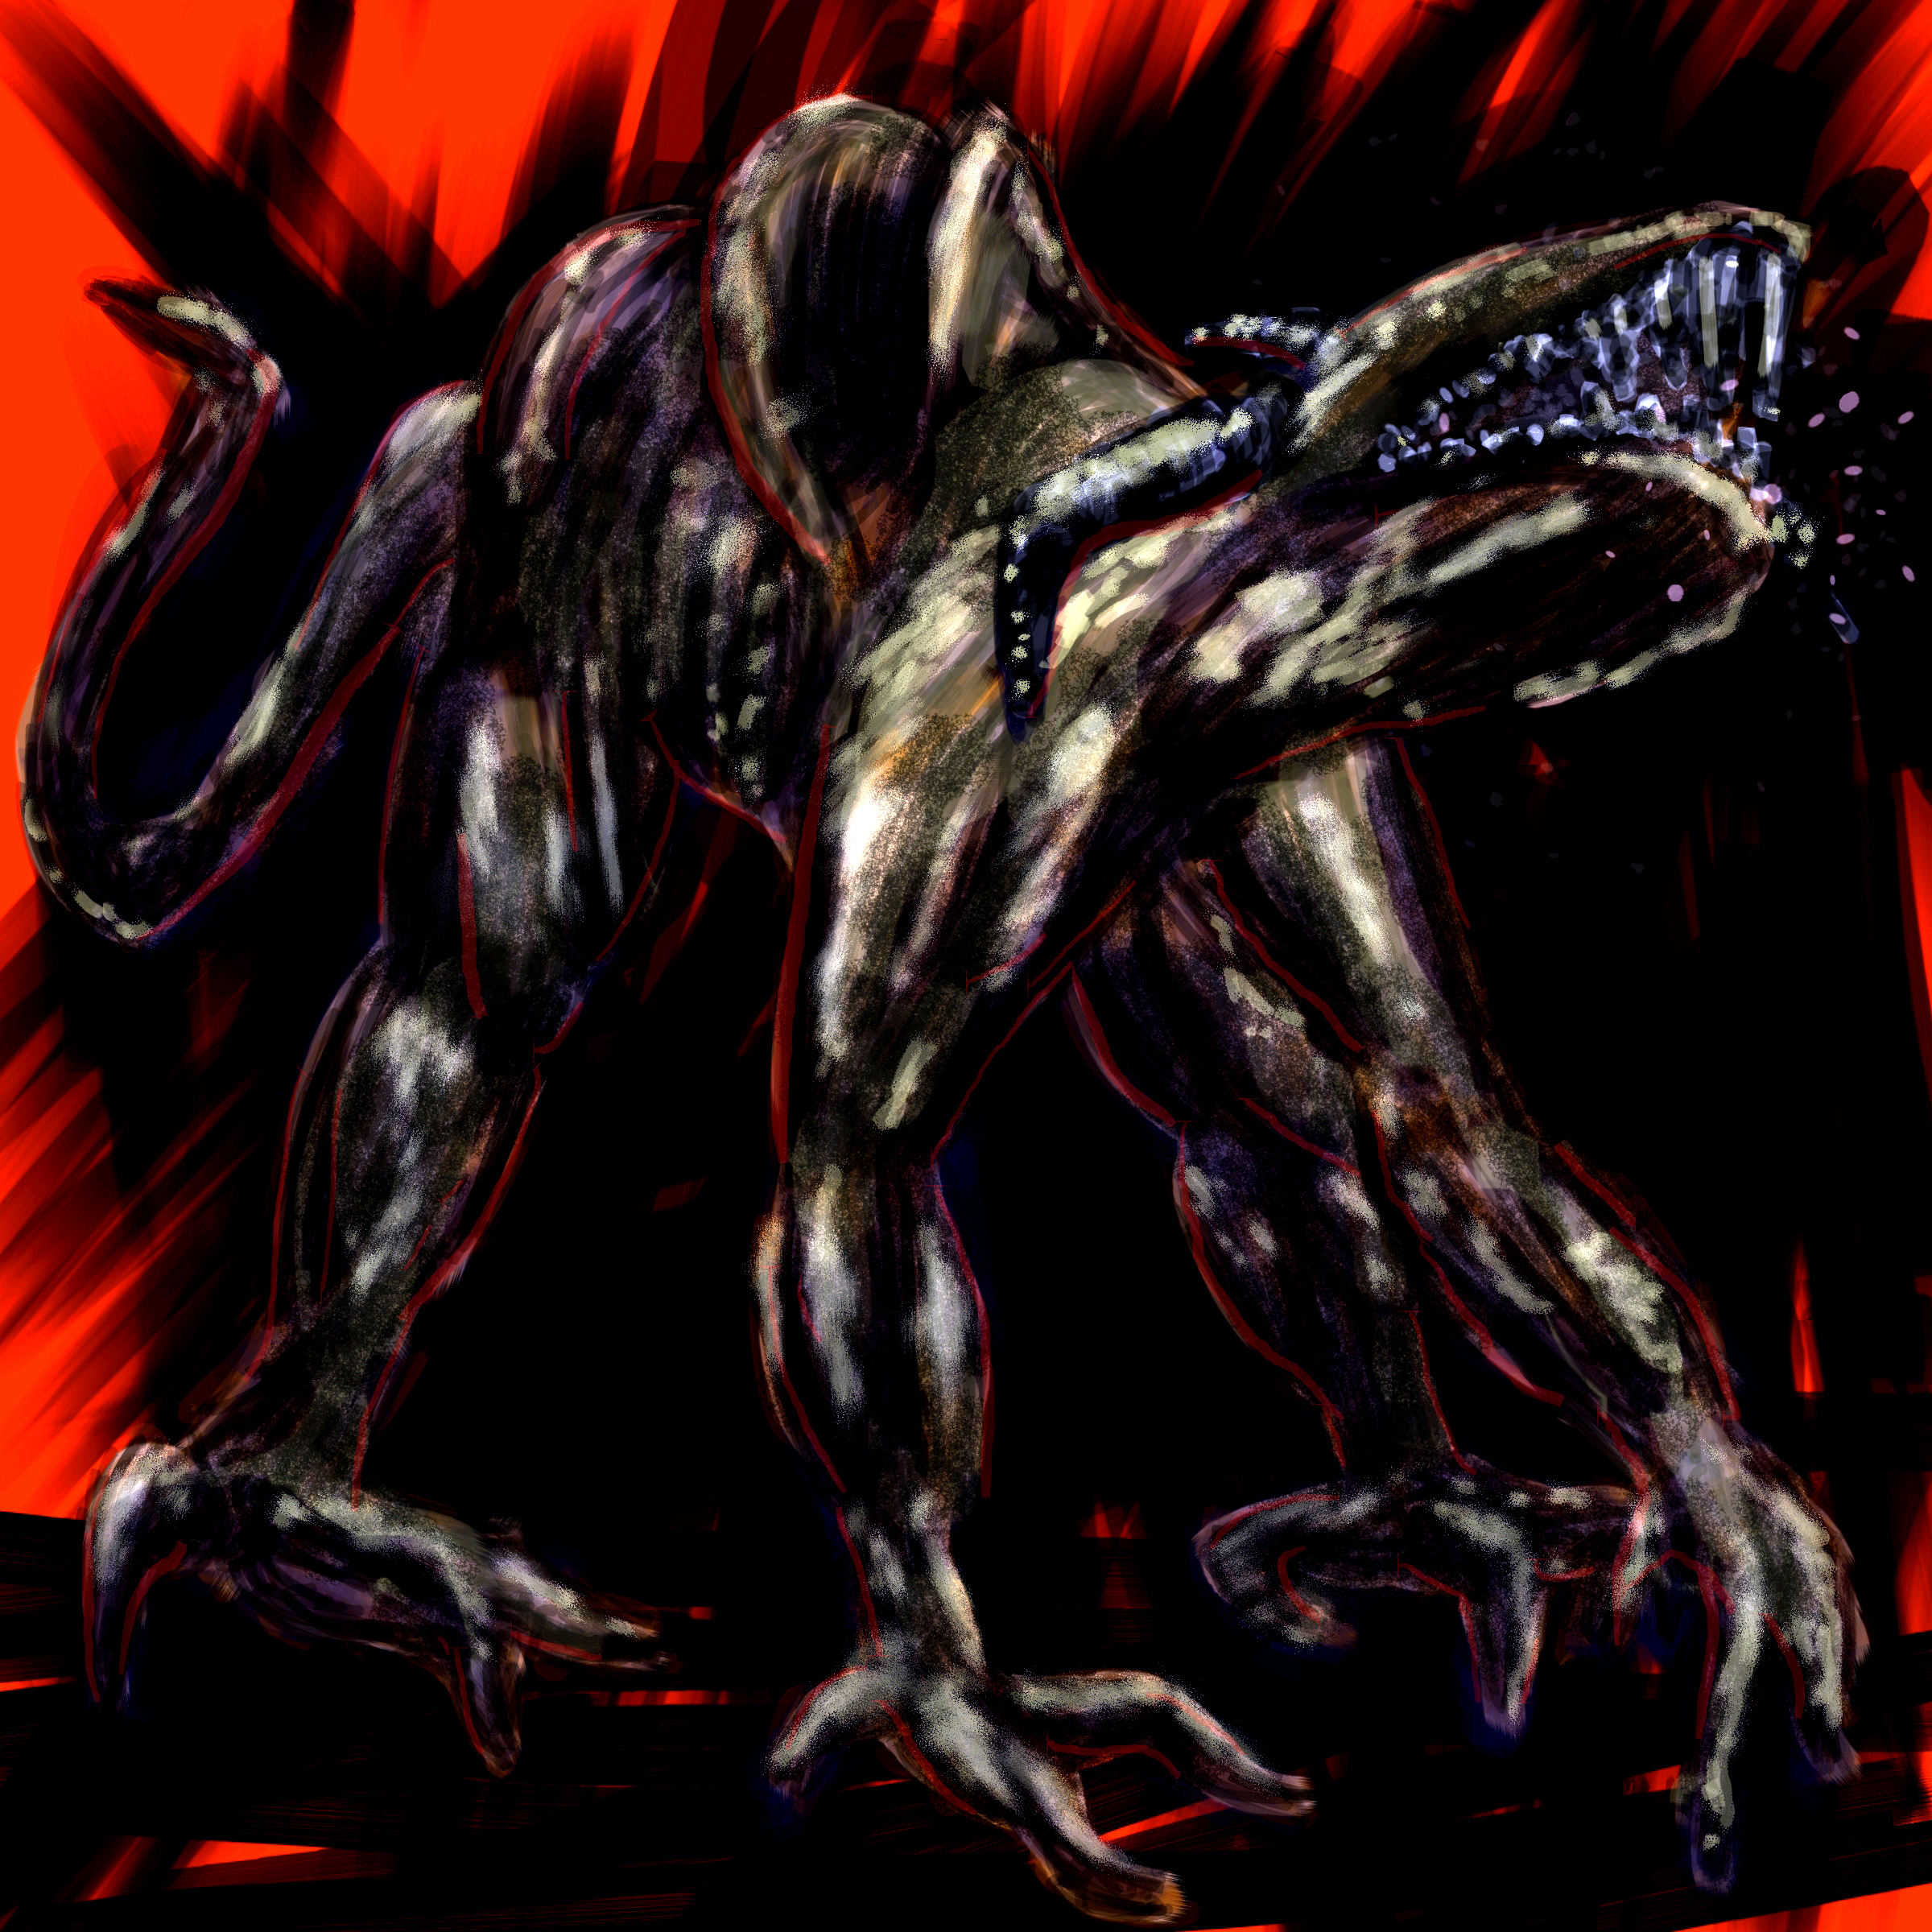 creature01_010b.jpg